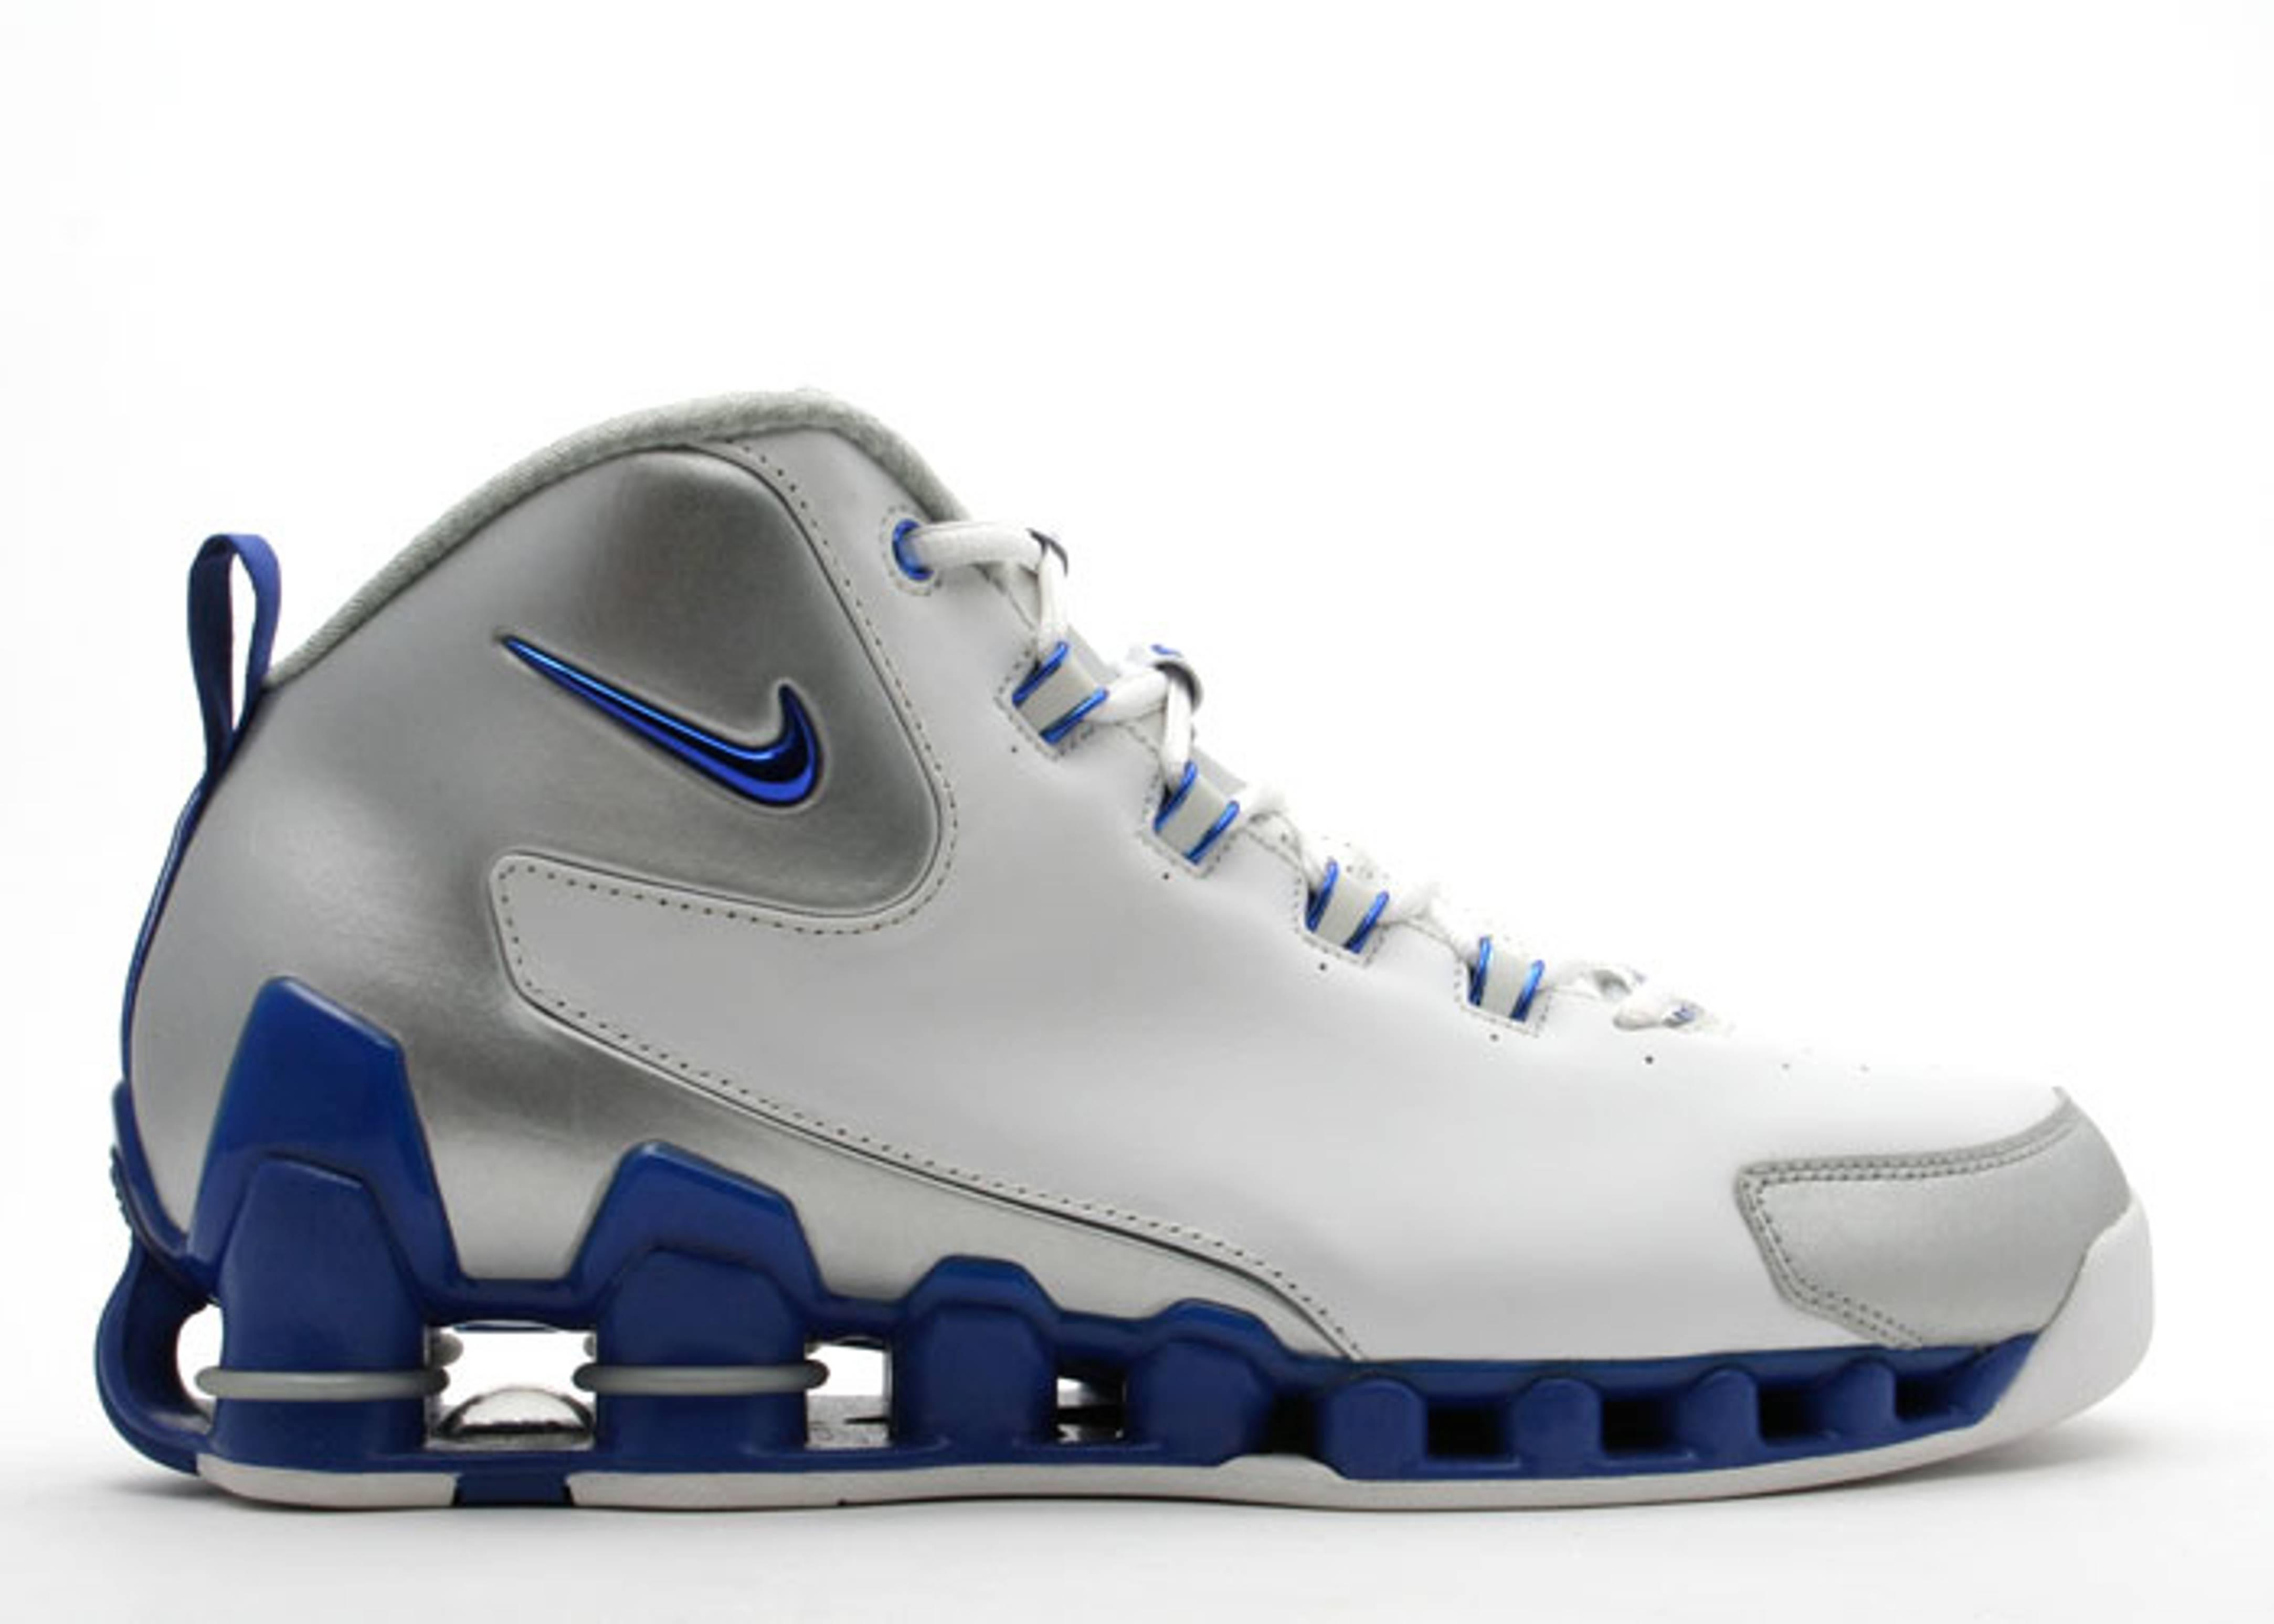 2d8d74522c5 ... Shox Vc 3 - Nike - 307111 141 - white silver-royal Flight Club ...